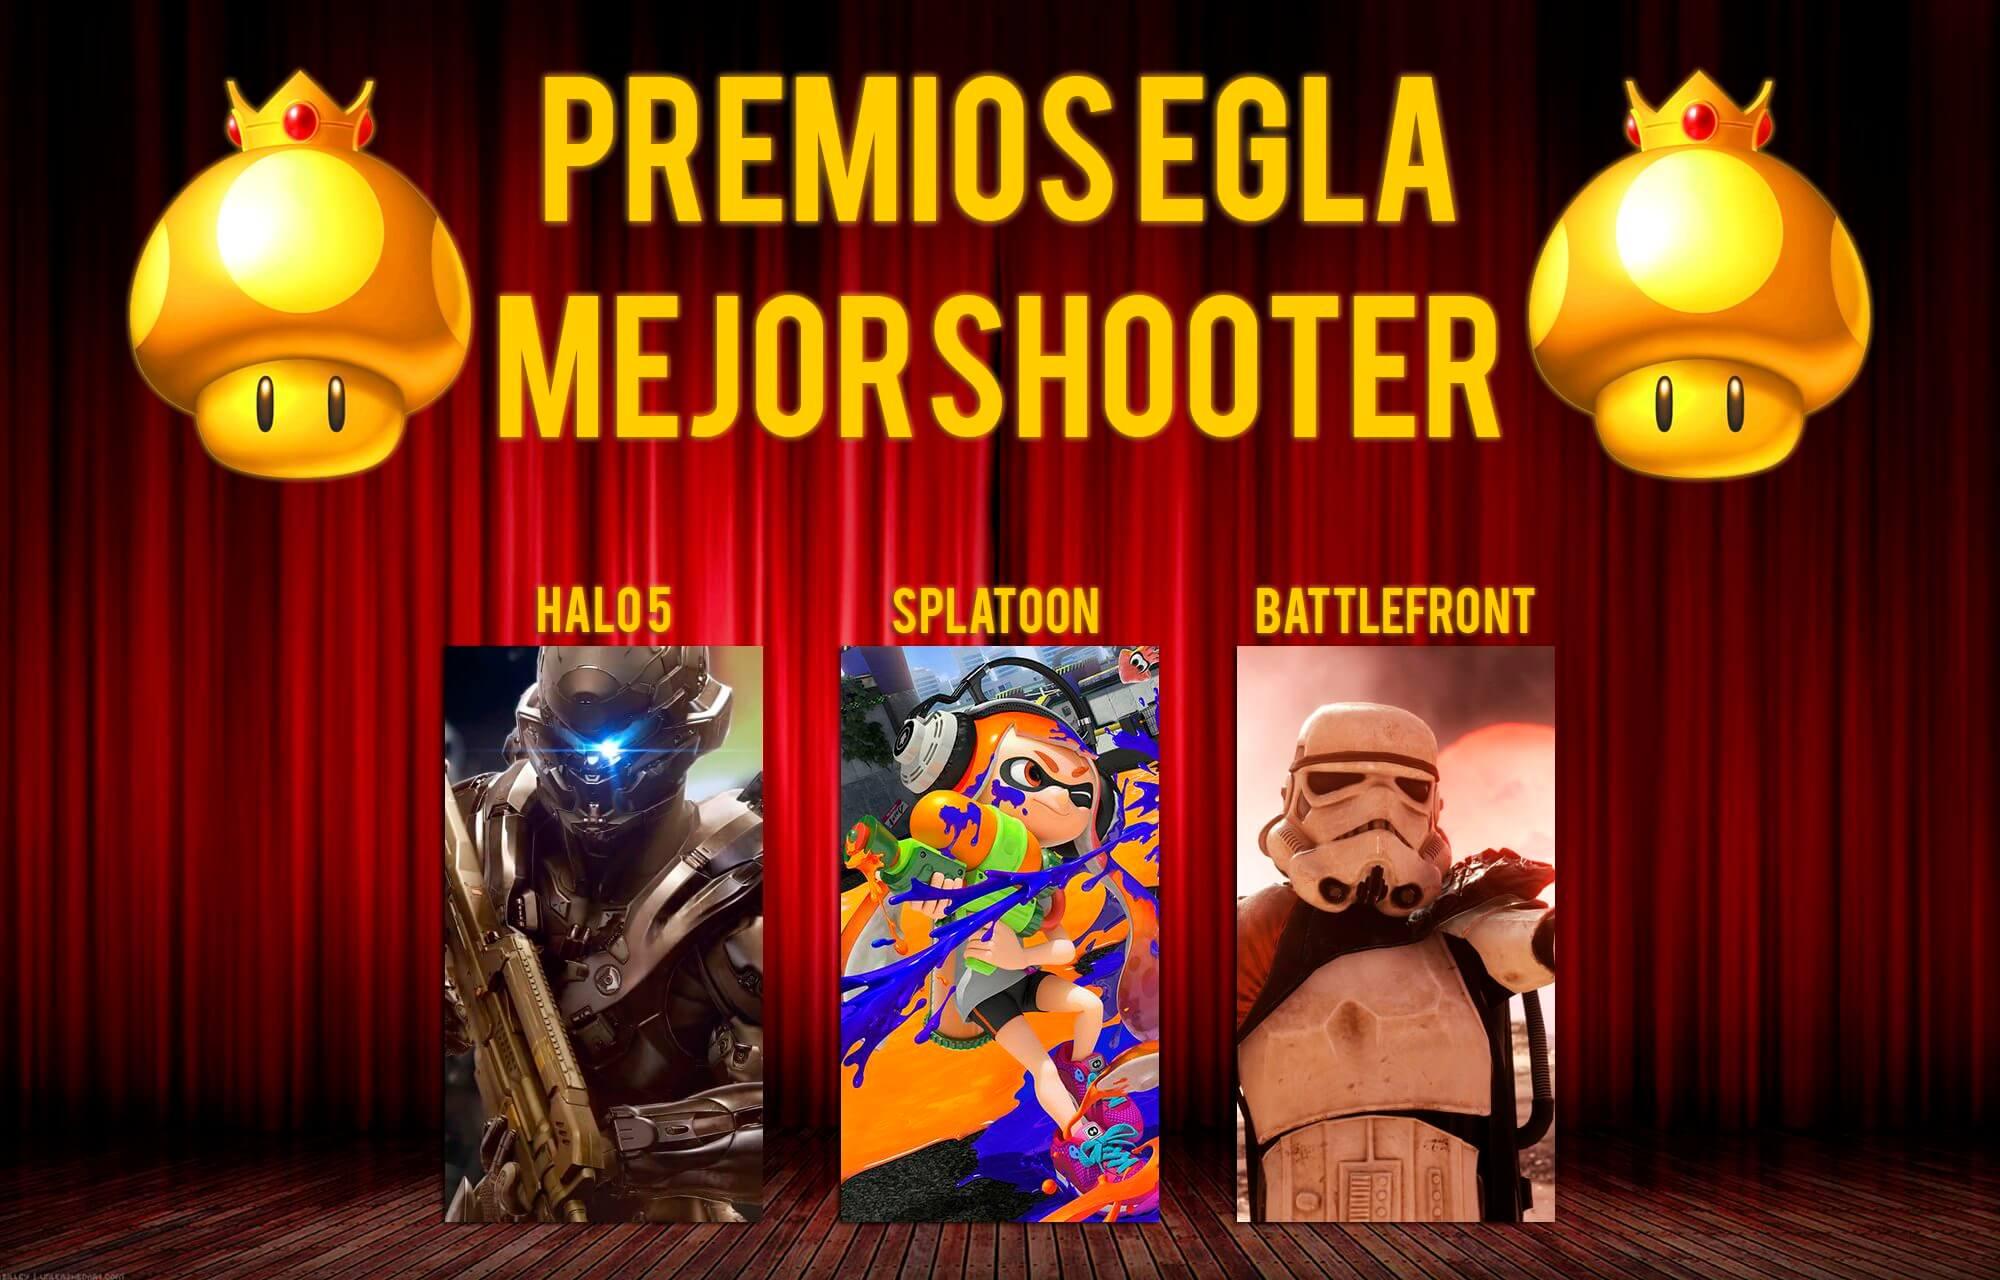 Premios EGLA 2015 Mejor Shooter